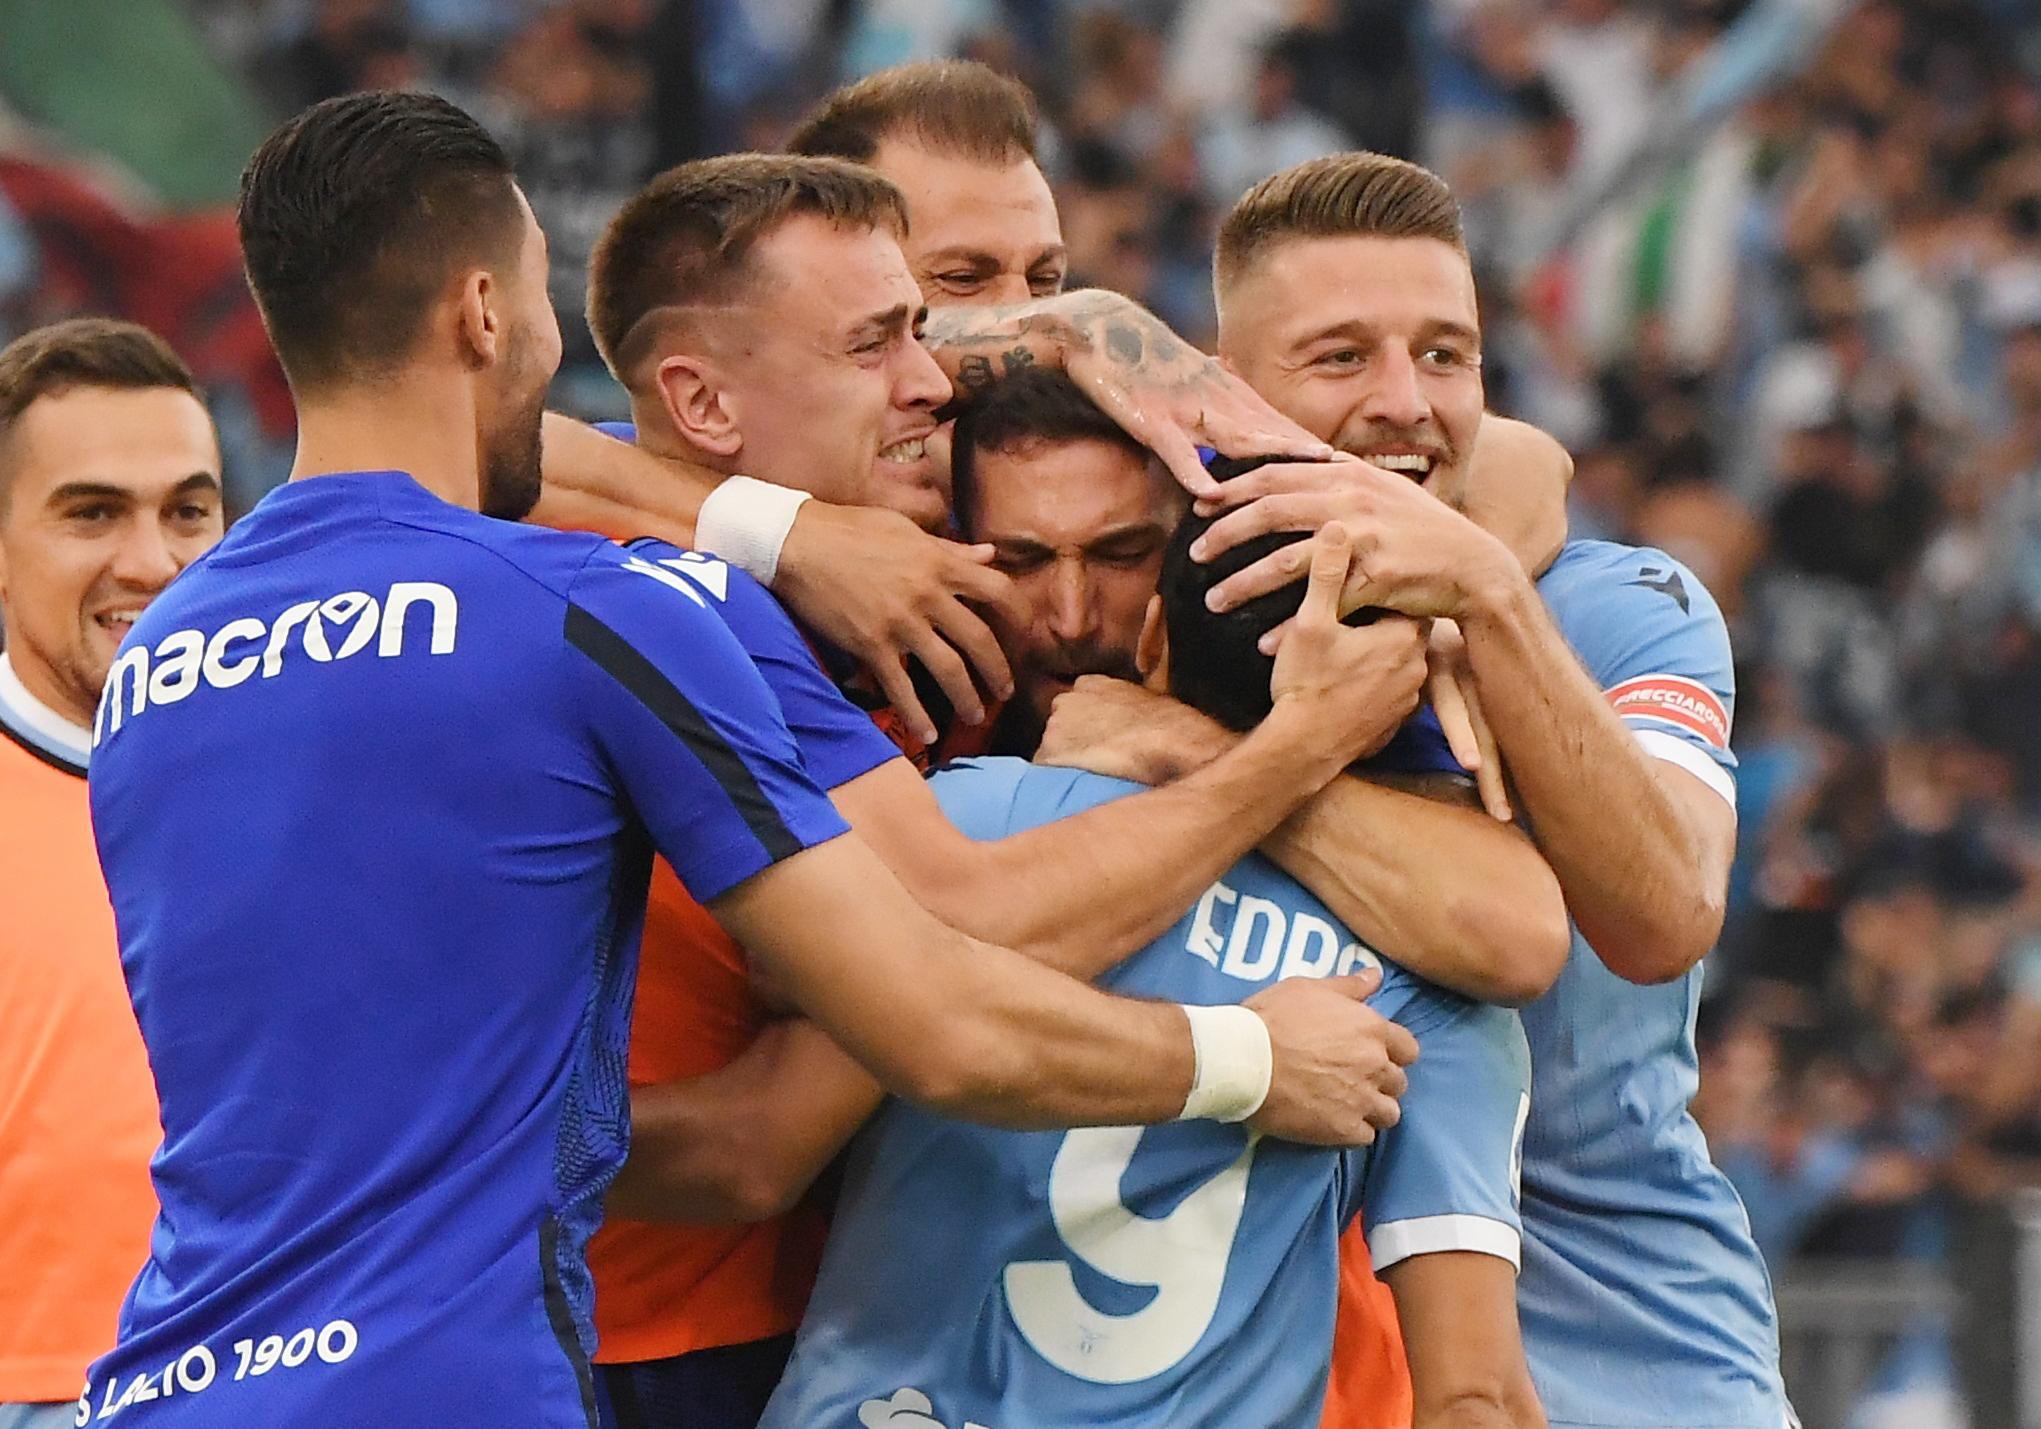 Serie A, Λάτσιο – Ρόμα 3-2: Κουμάντο στη Ρώμη κάνουν οι «λατσιάλι»